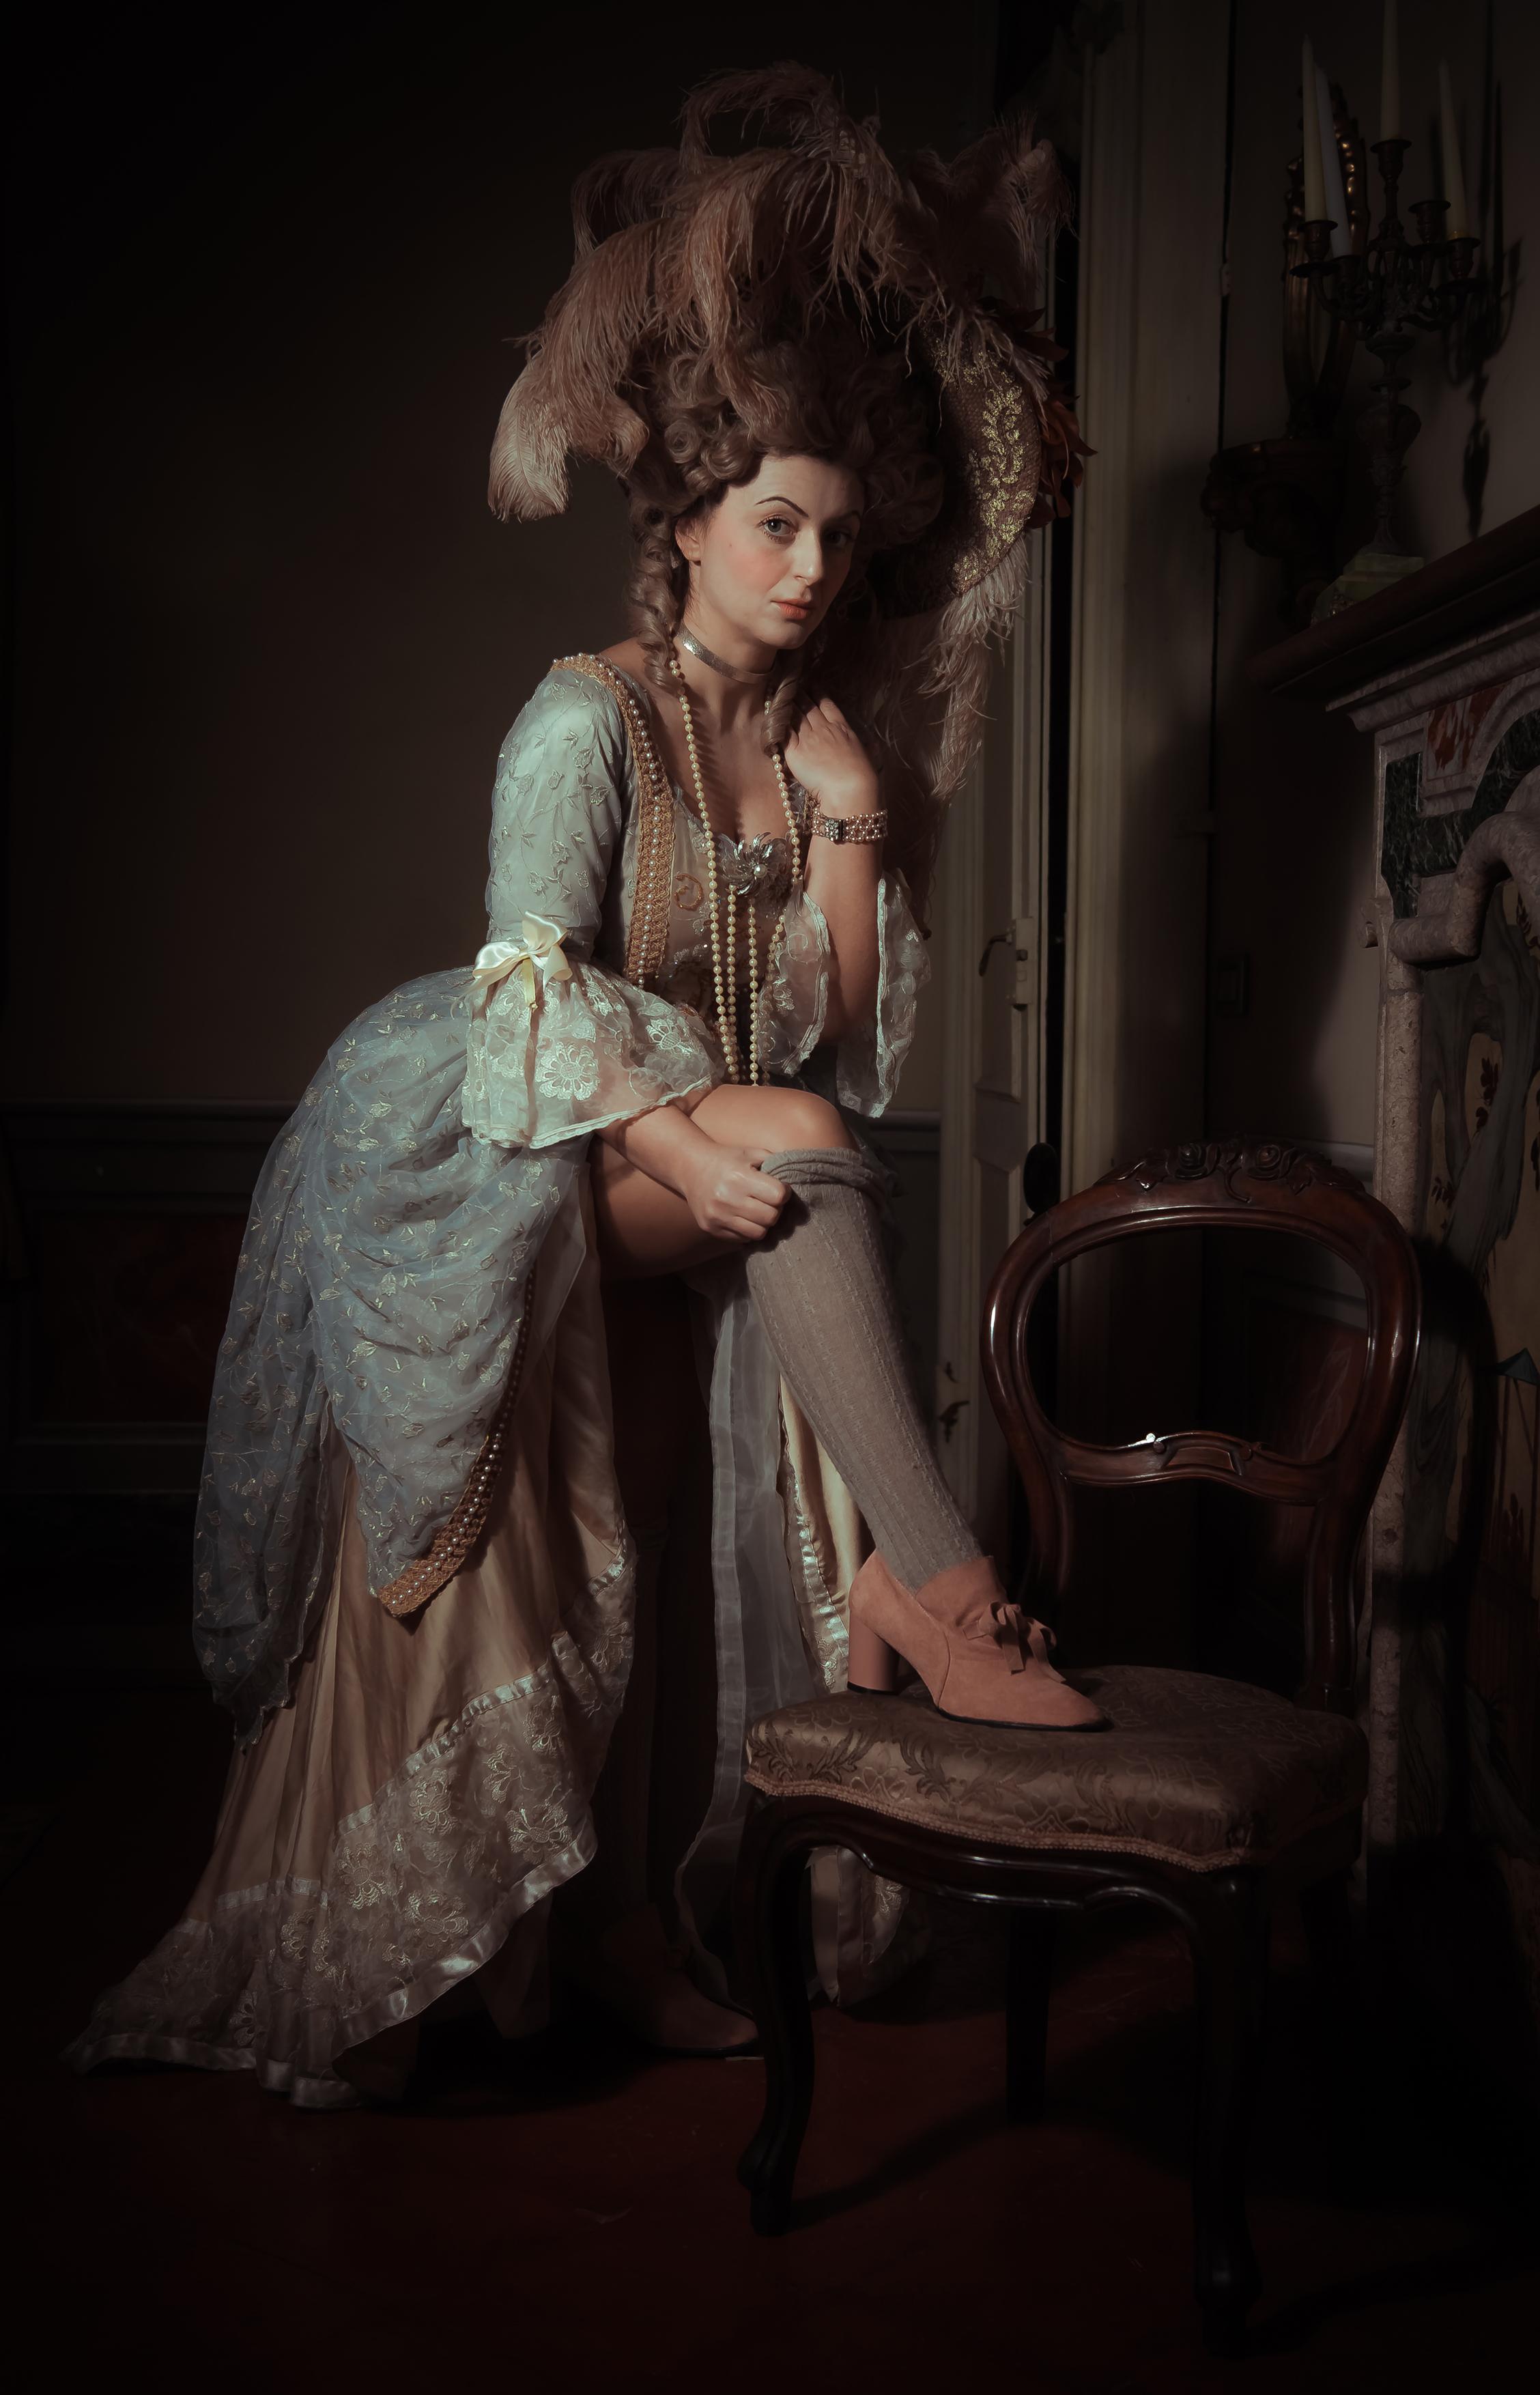 Model: Serena Chiaffredo